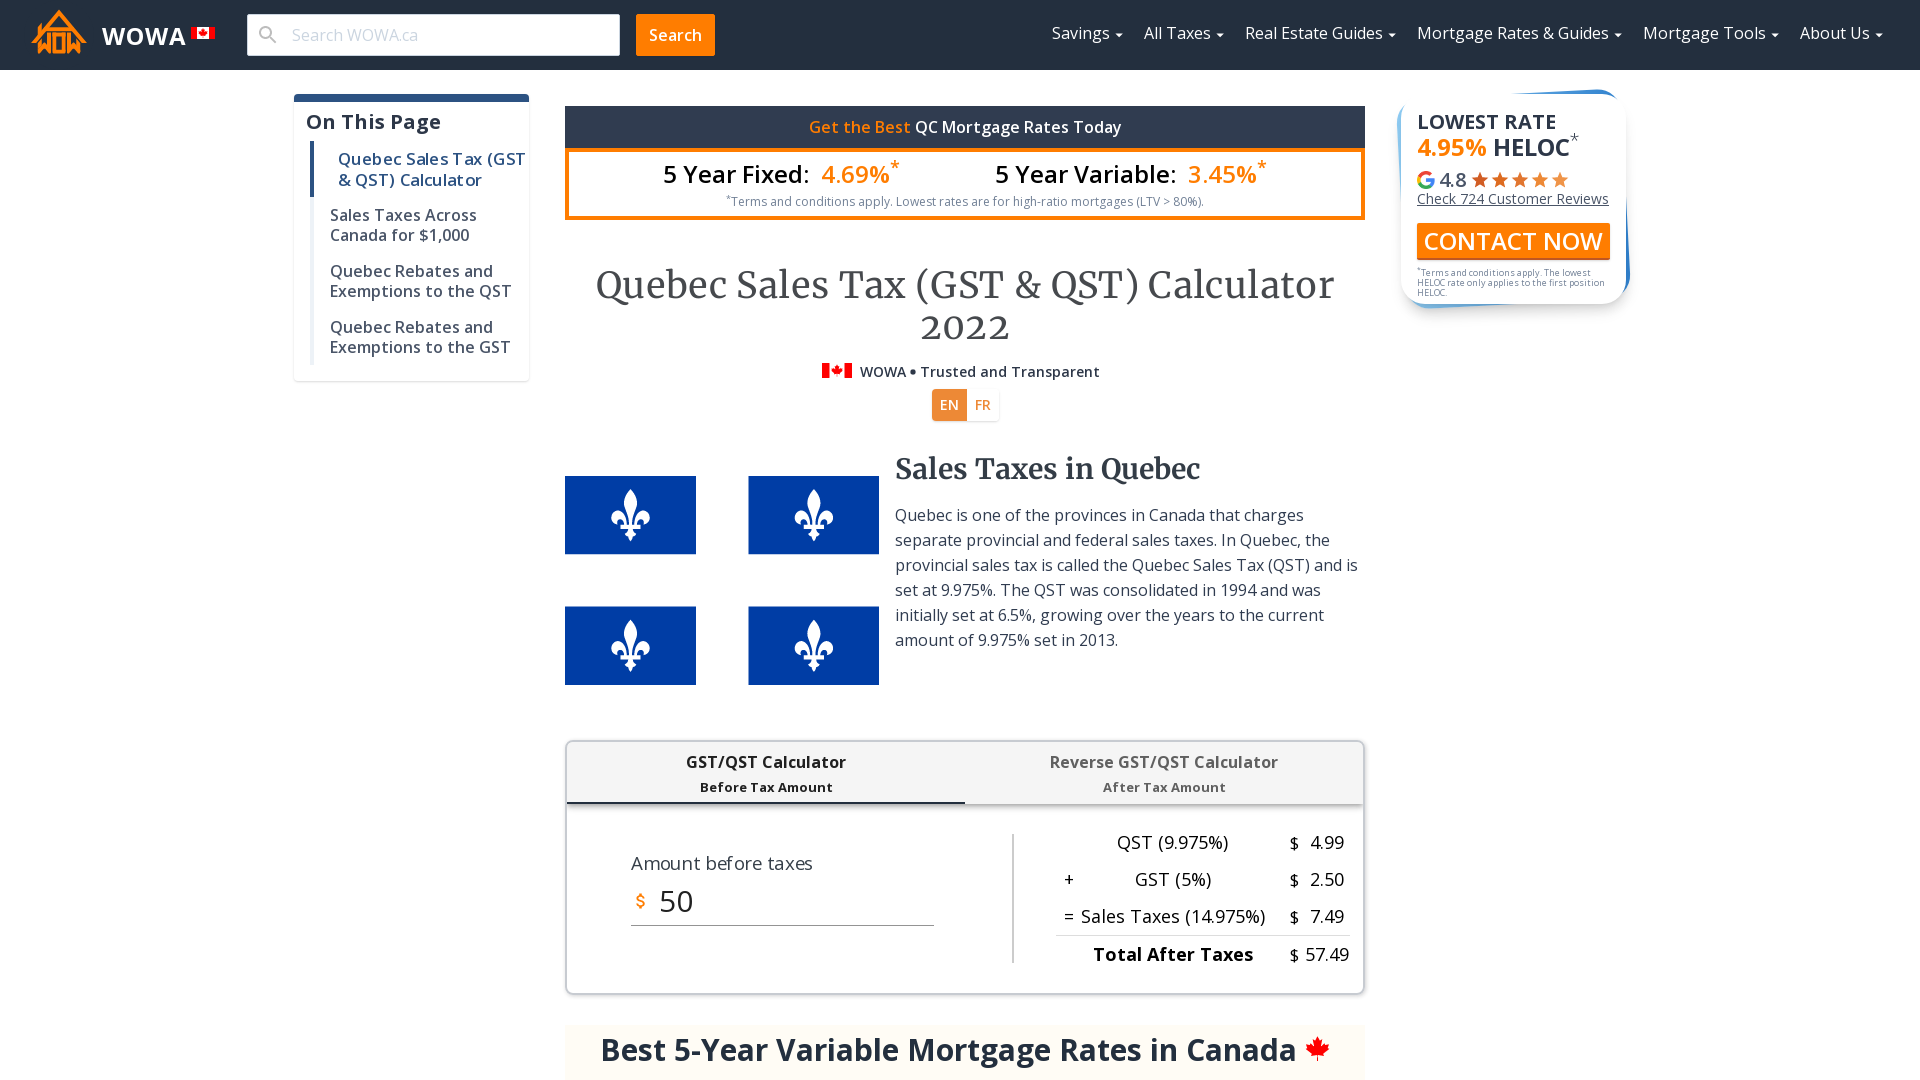 Quebec Sales Tax Gst Qst Calculator 2021 Wowa Ca